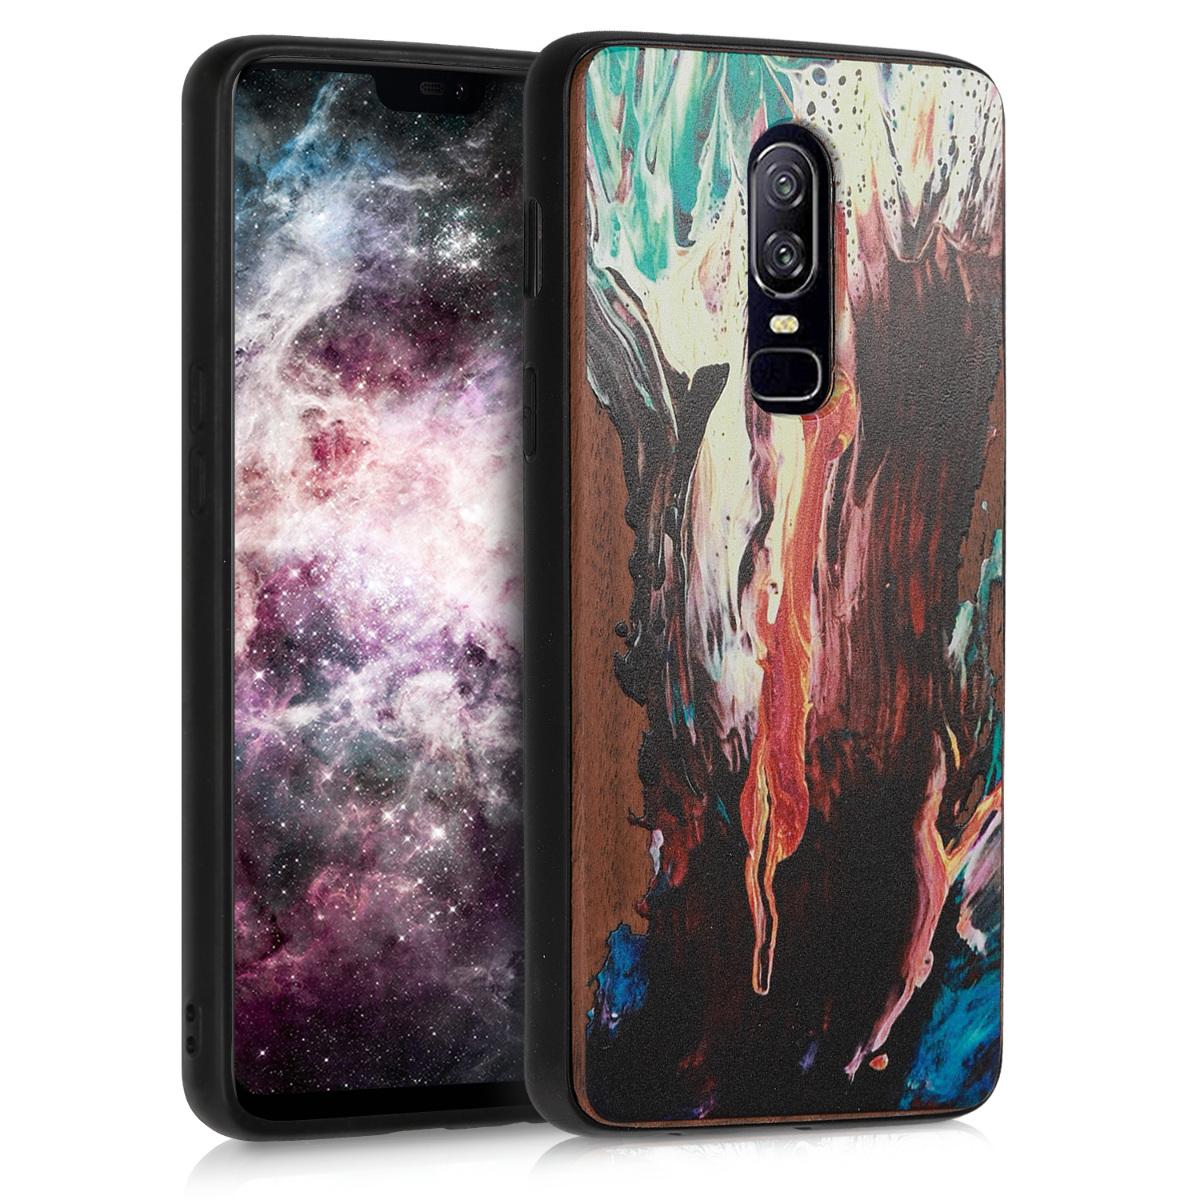 KW Σκληρή ξύλινη θήκη OnePlus 6 -  Watercolor Waves (46684.04)